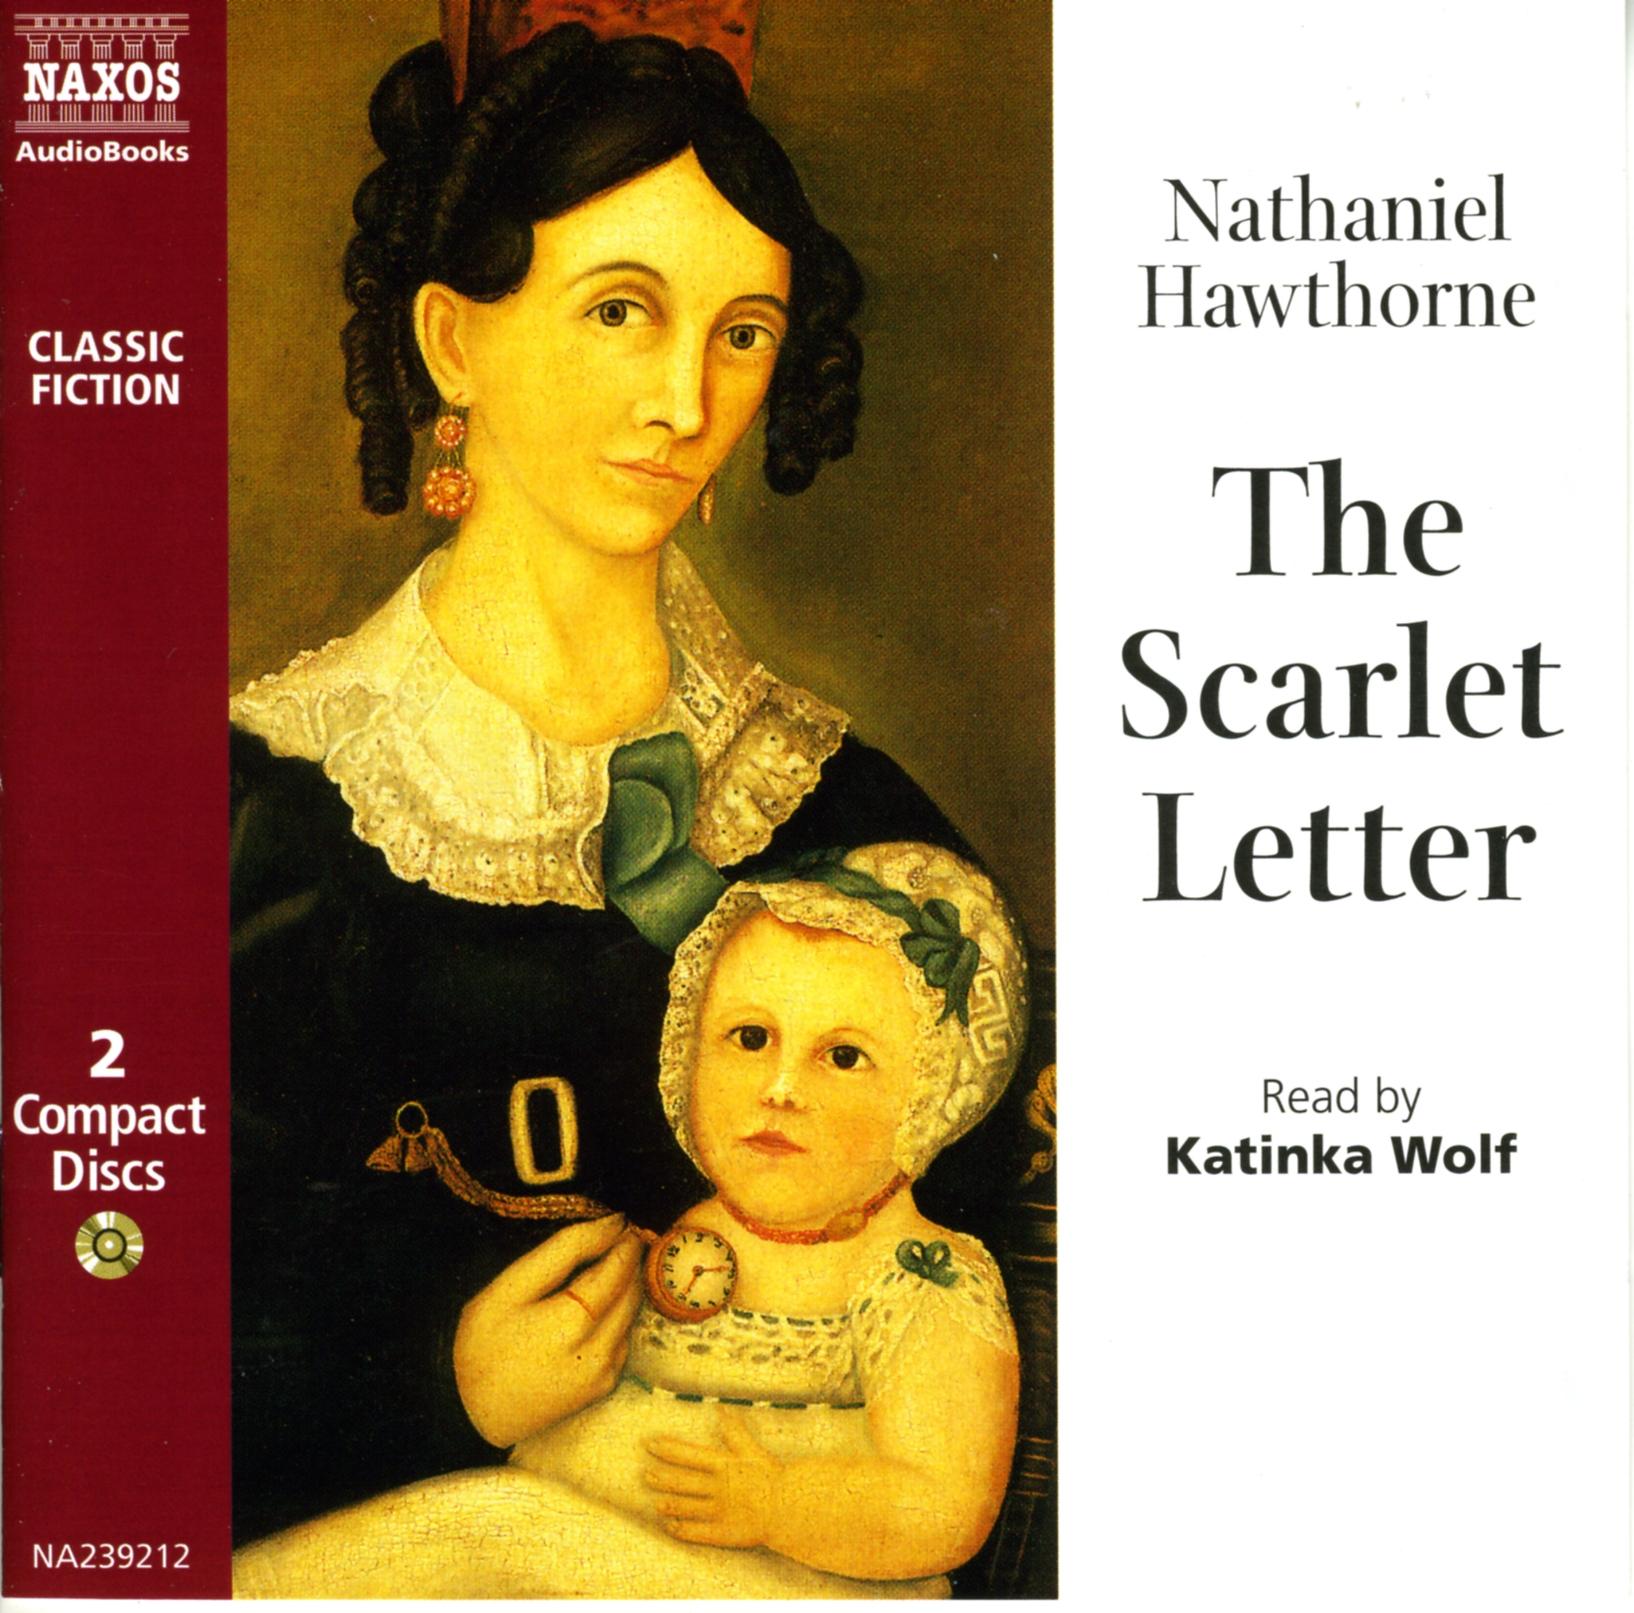 necessity identity scarlet letter nathaniel hawthorne disc